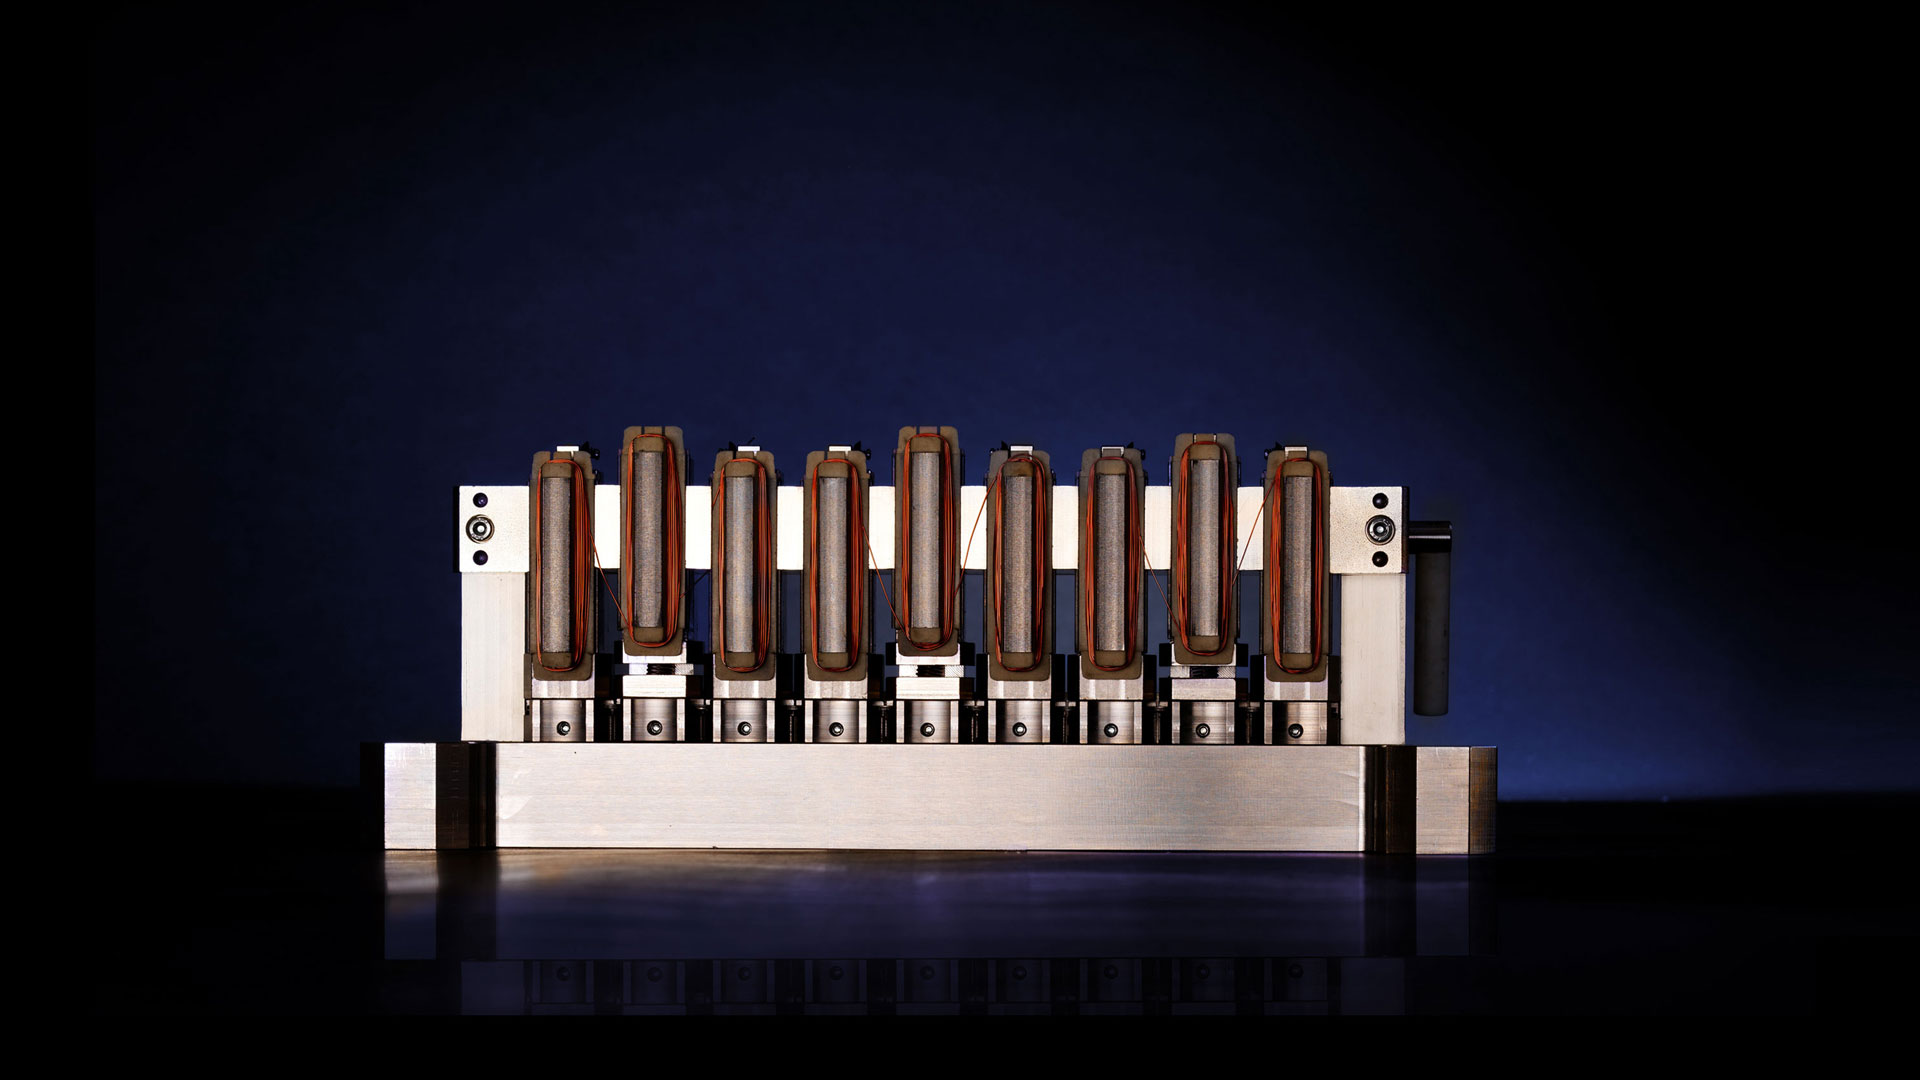 tecnologia-avvolgimento-ago-motori-elettrici-brushless-2a